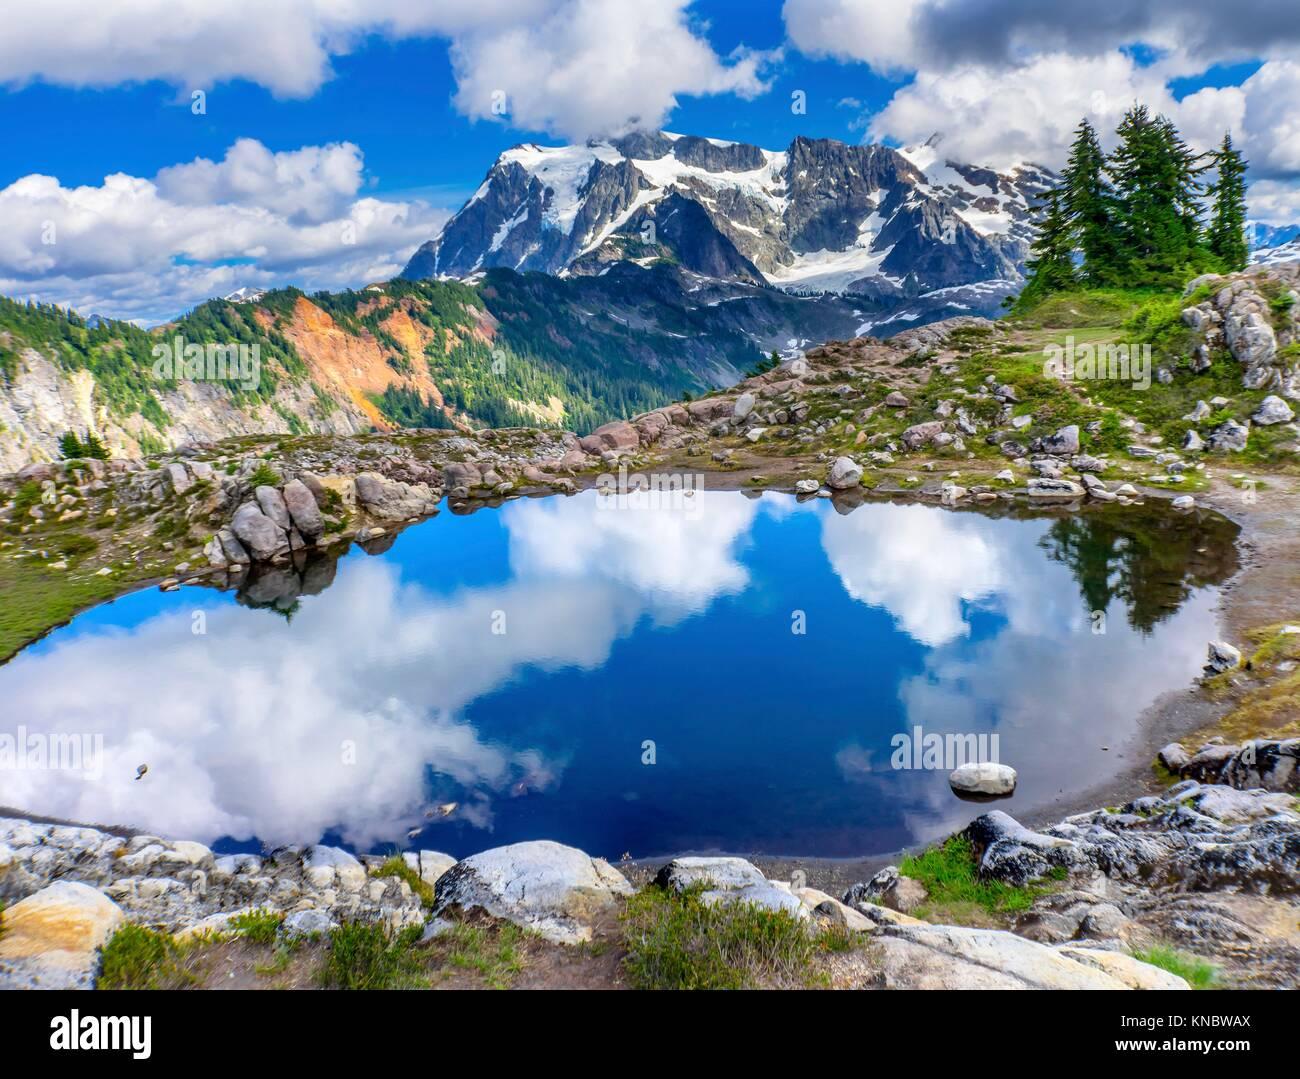 Mount Shuksan Pool Reflection Summer Artist Point Mount Baker Highway. Pacific Northwest, Washington State, Snow - Stock Image